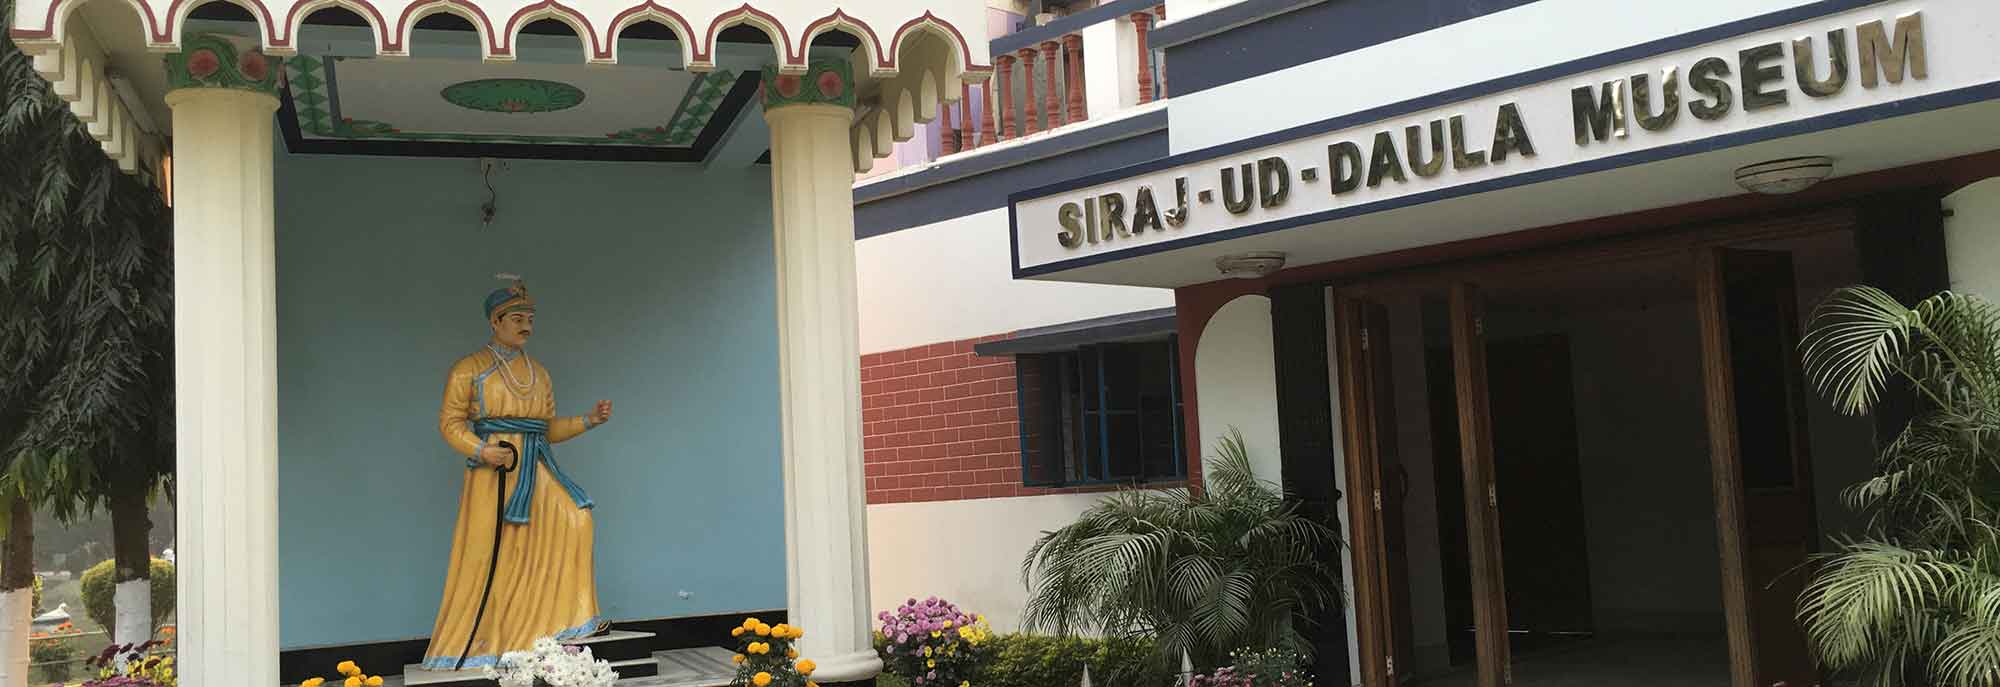 Siraj Ud Daula Museum